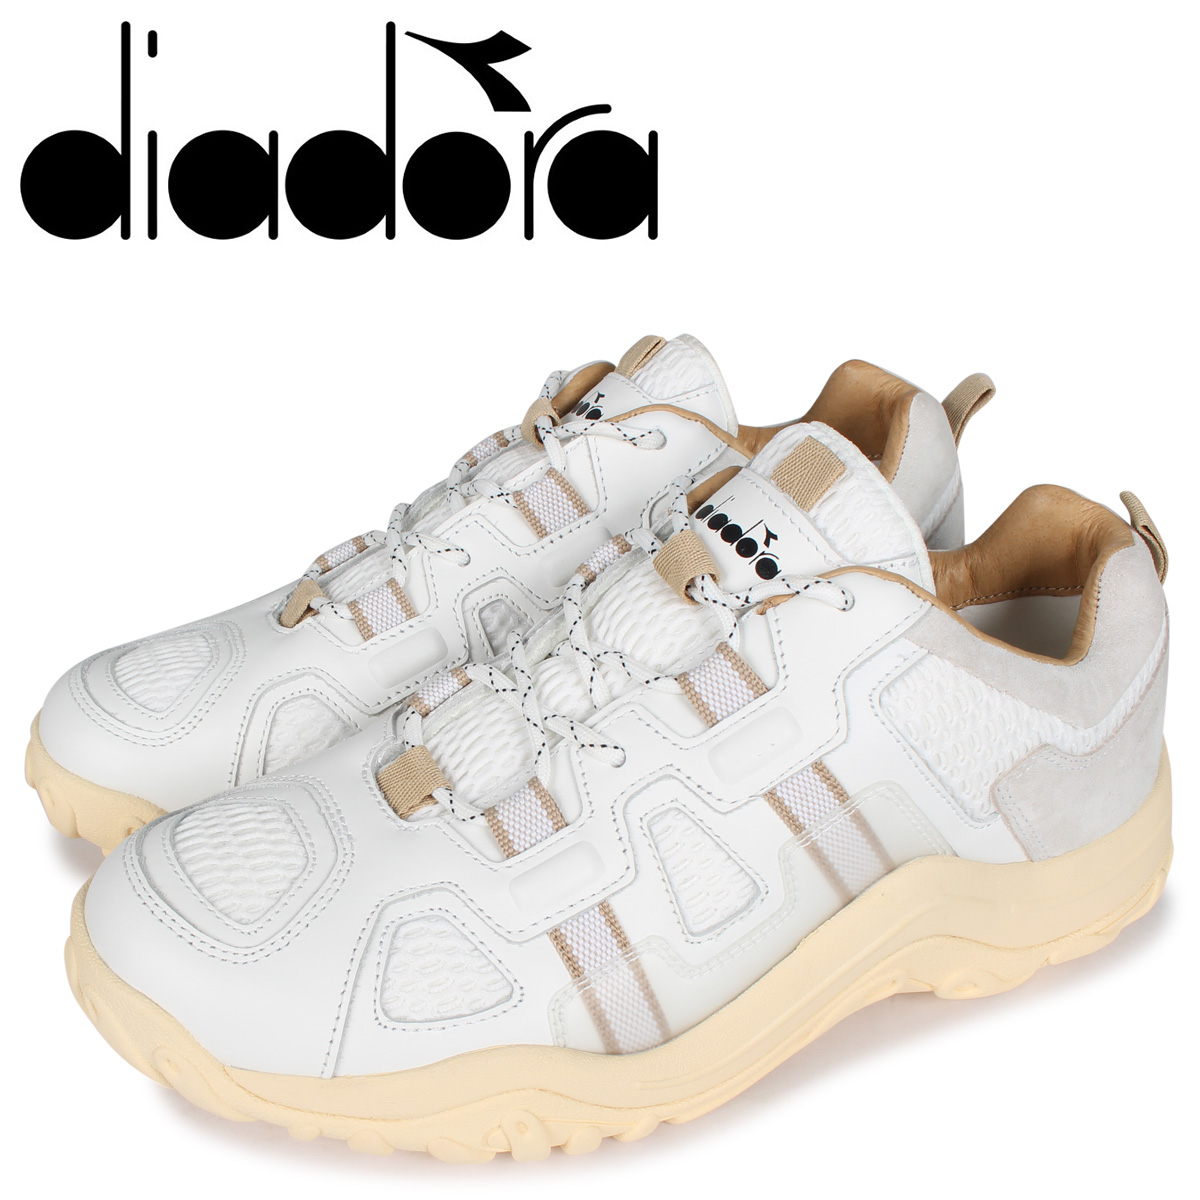 Diadora ディアドラ アルパカ スニーカー メンズ ALPACA ホワイト 白 176336-0657 [4/23 新入荷]